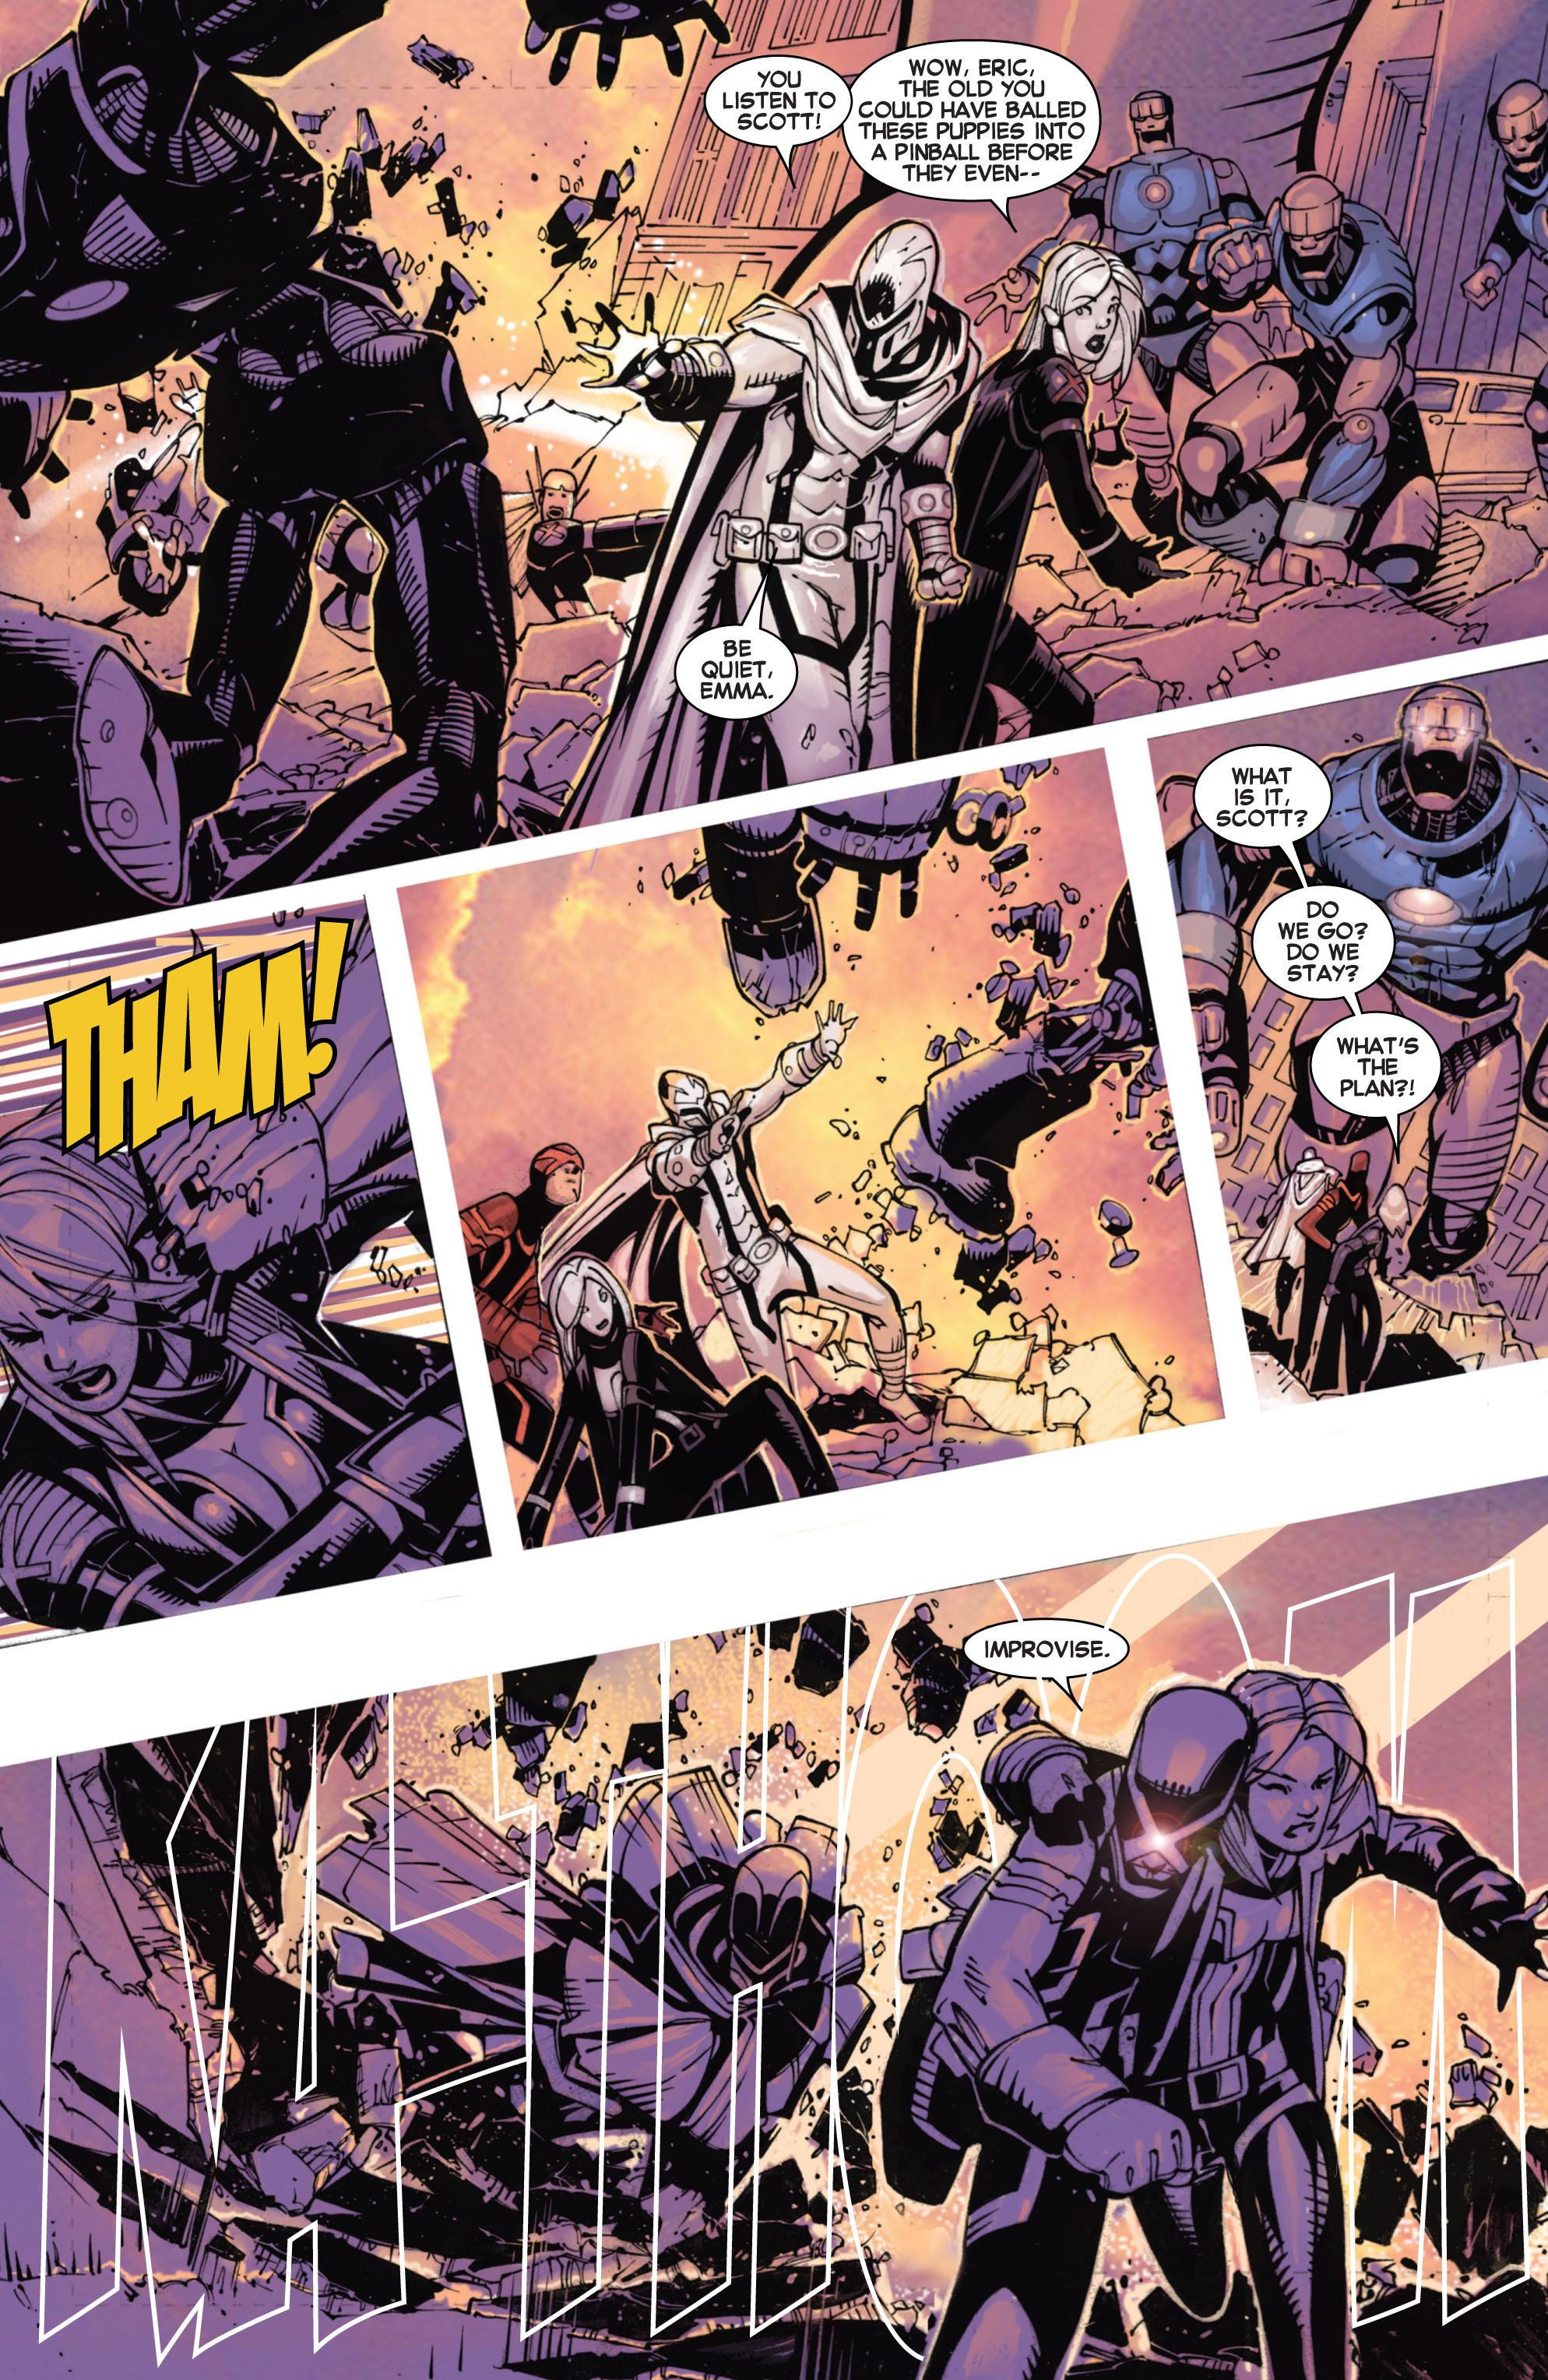 Read online Uncanny X-Men (2013) comic -  Issue # _TPB 1 - Revolution - 16